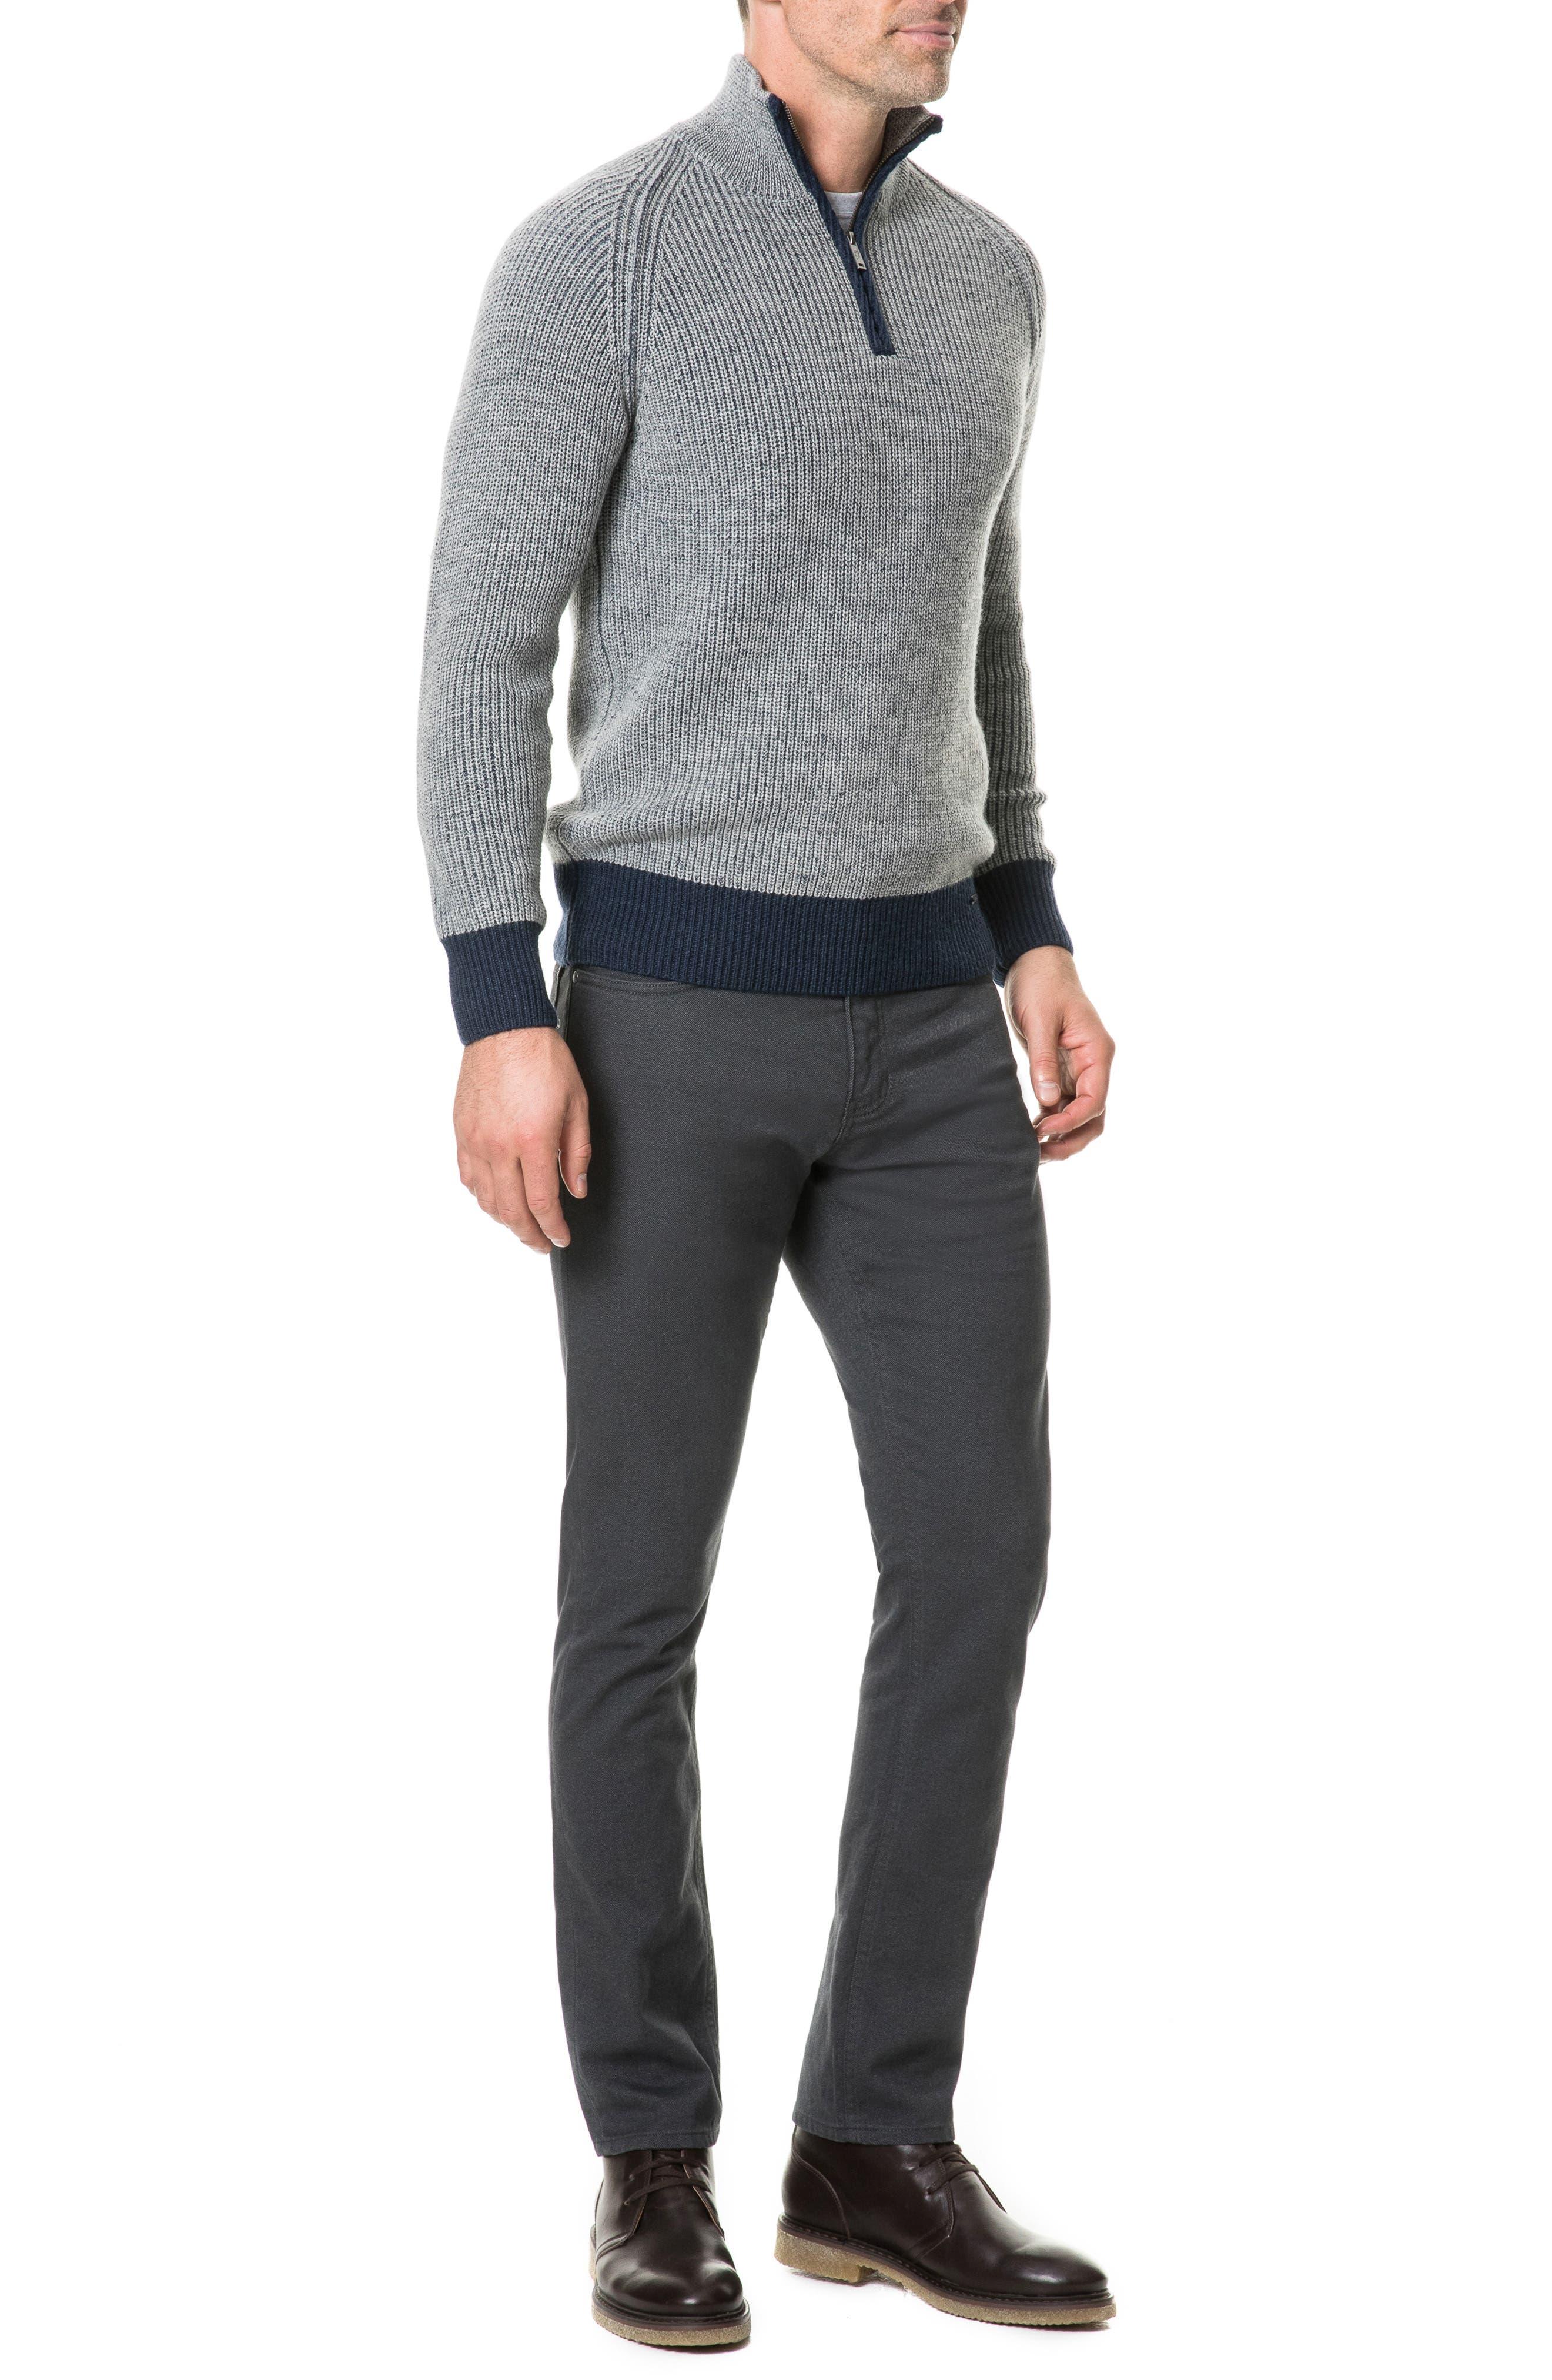 Mackinder Quarter Zip Merino Wool Sweater,                             Alternate thumbnail 5, color,                             268